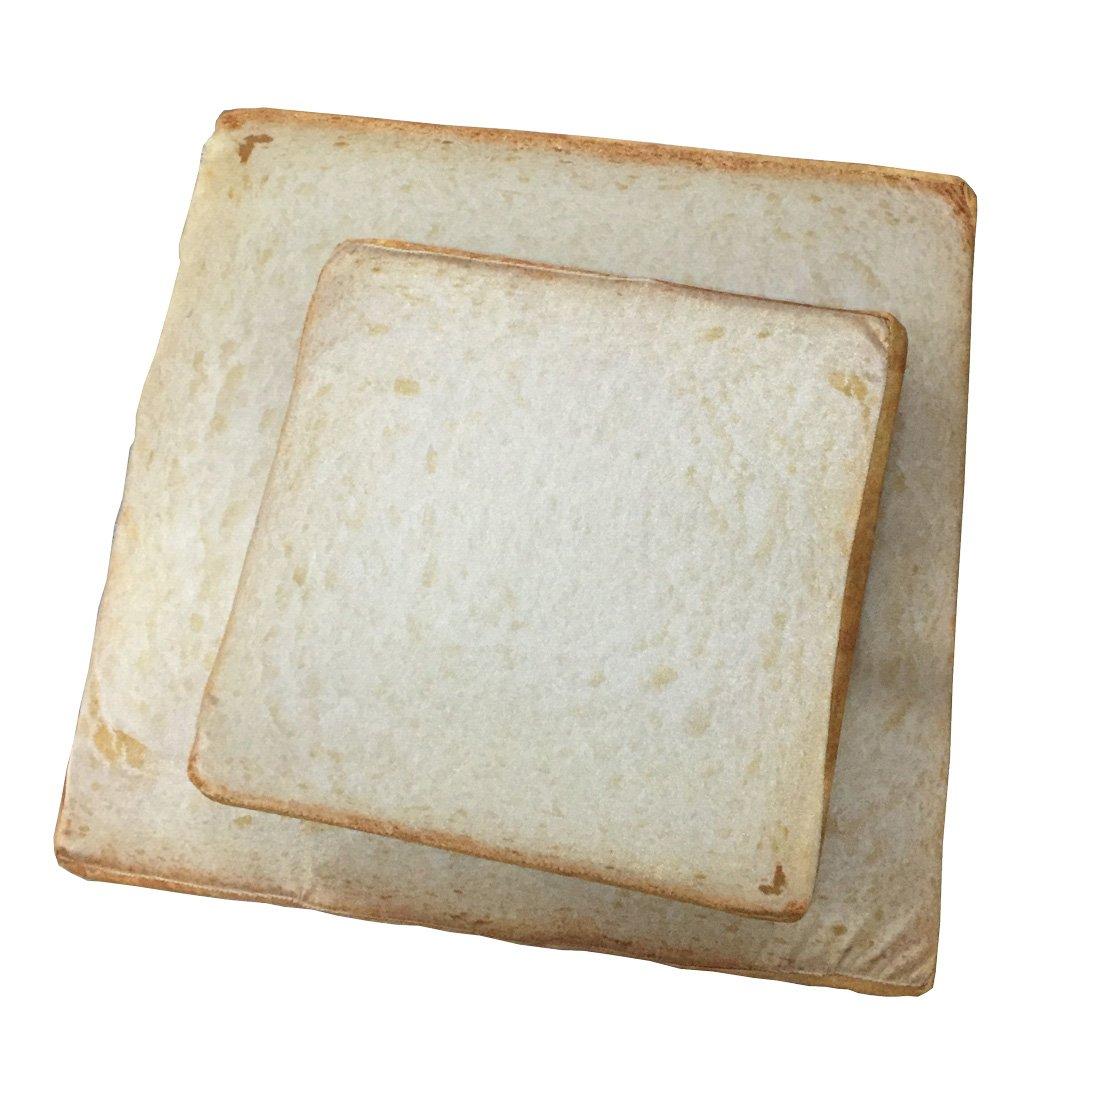 Pet Sofa Bread Cushion Pillow,Cat Cushion Mat (15.8 in X 15.8 in)